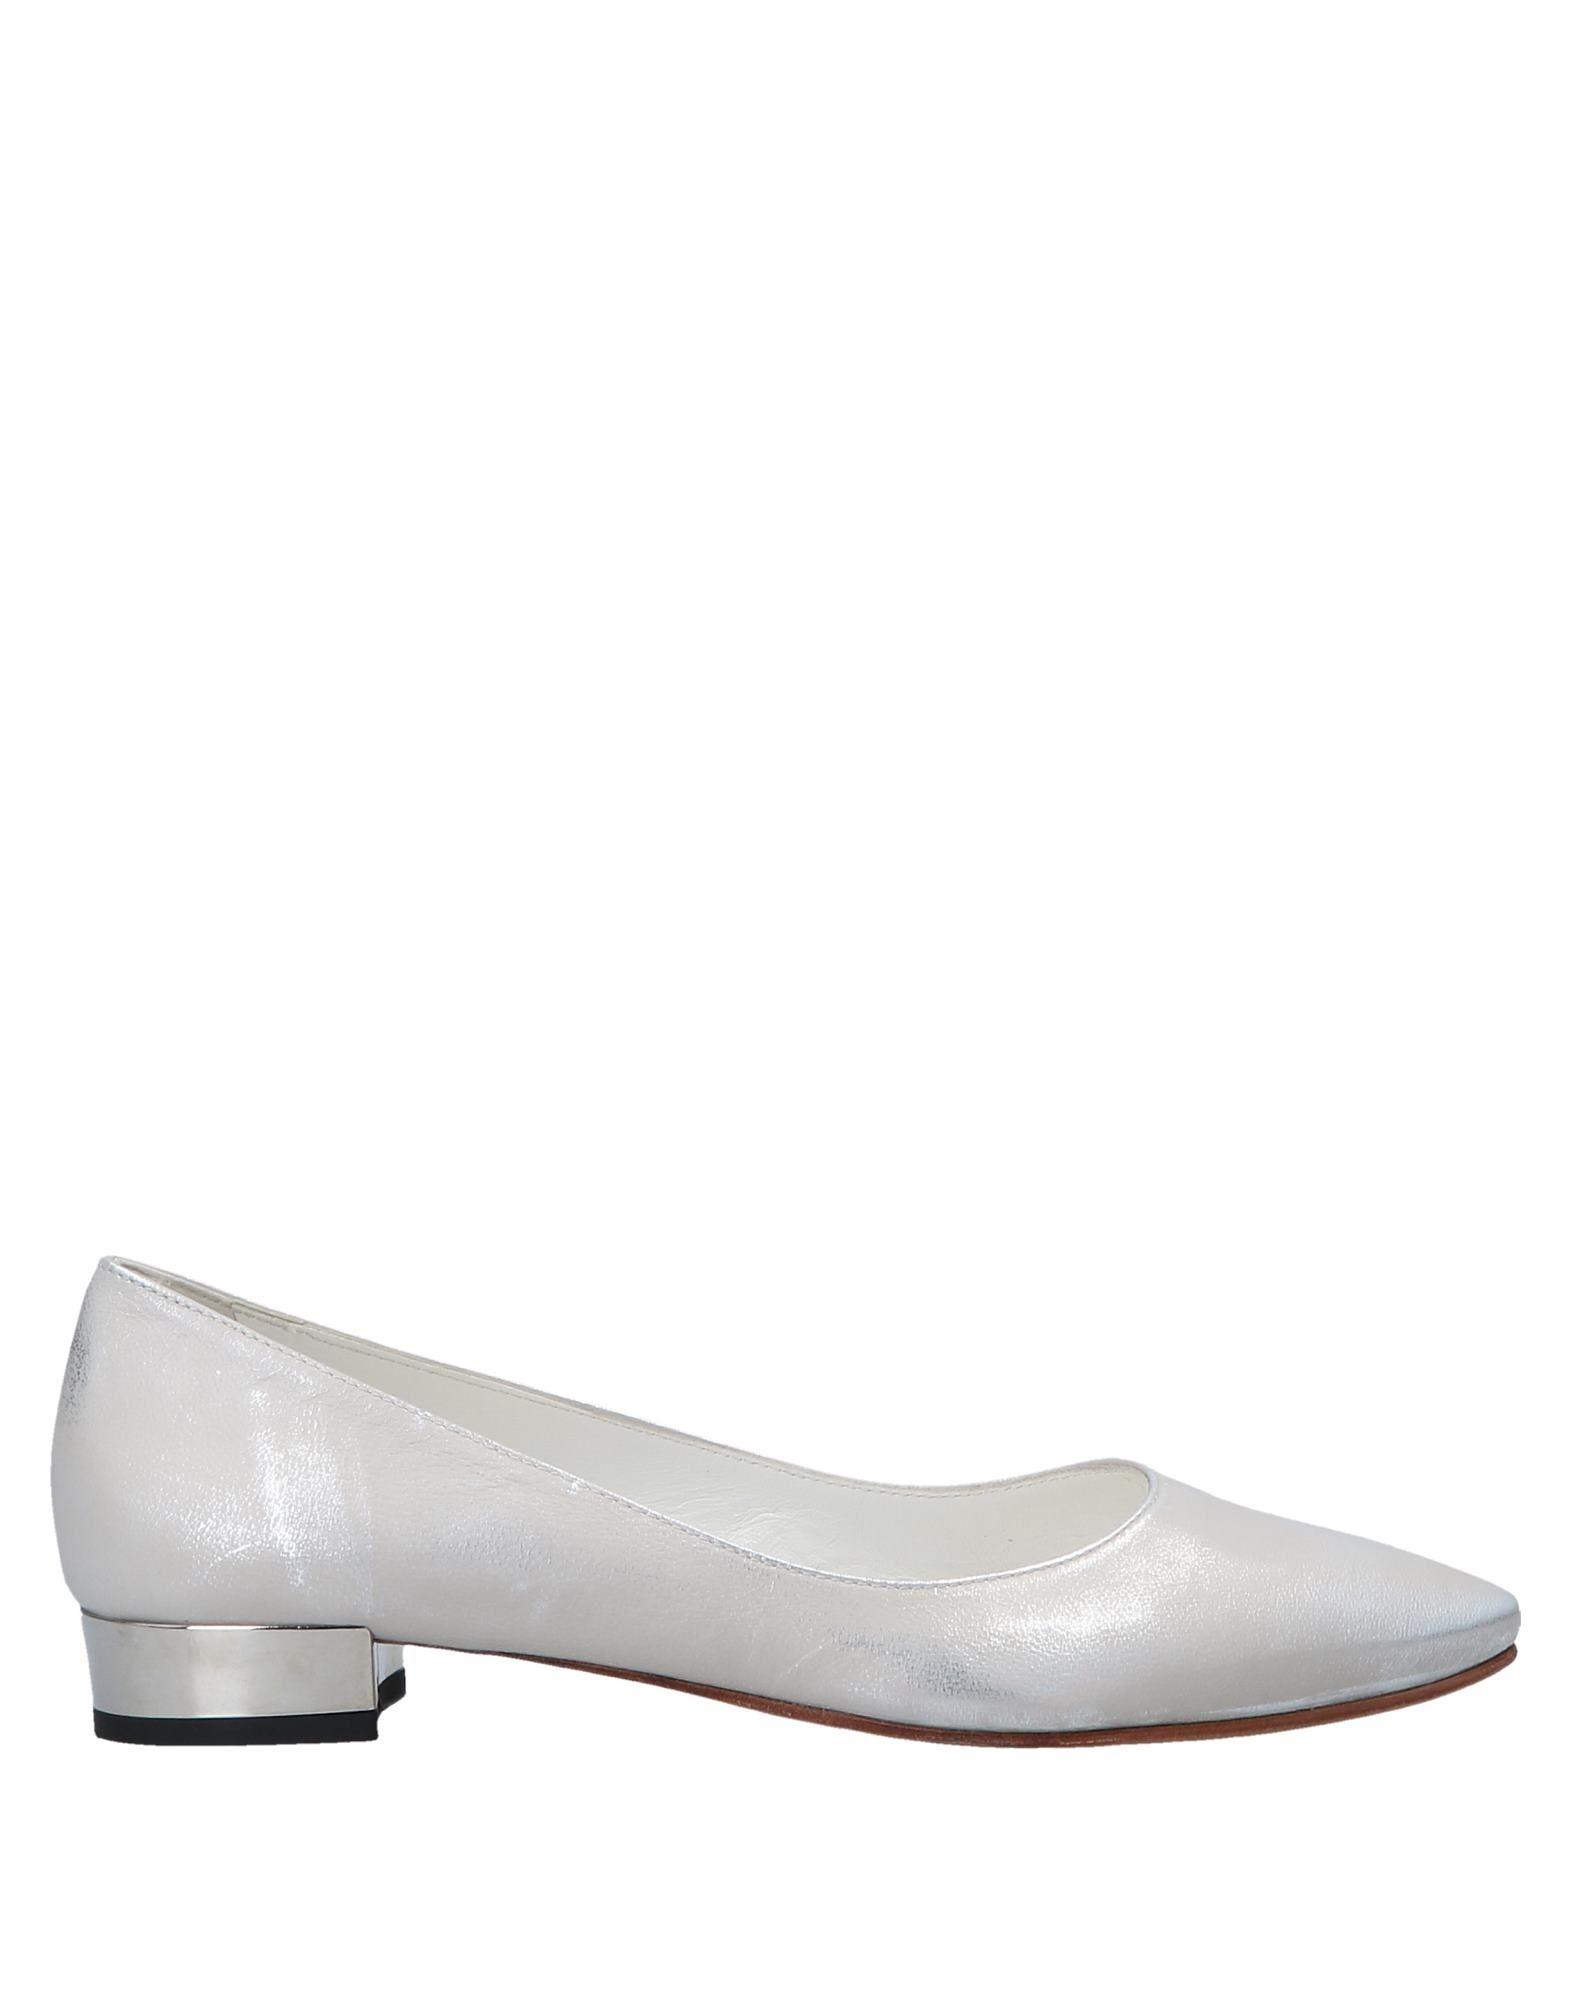 Angel Ballerinas Damen  11547449CO Gute Qualität beliebte Schuhe